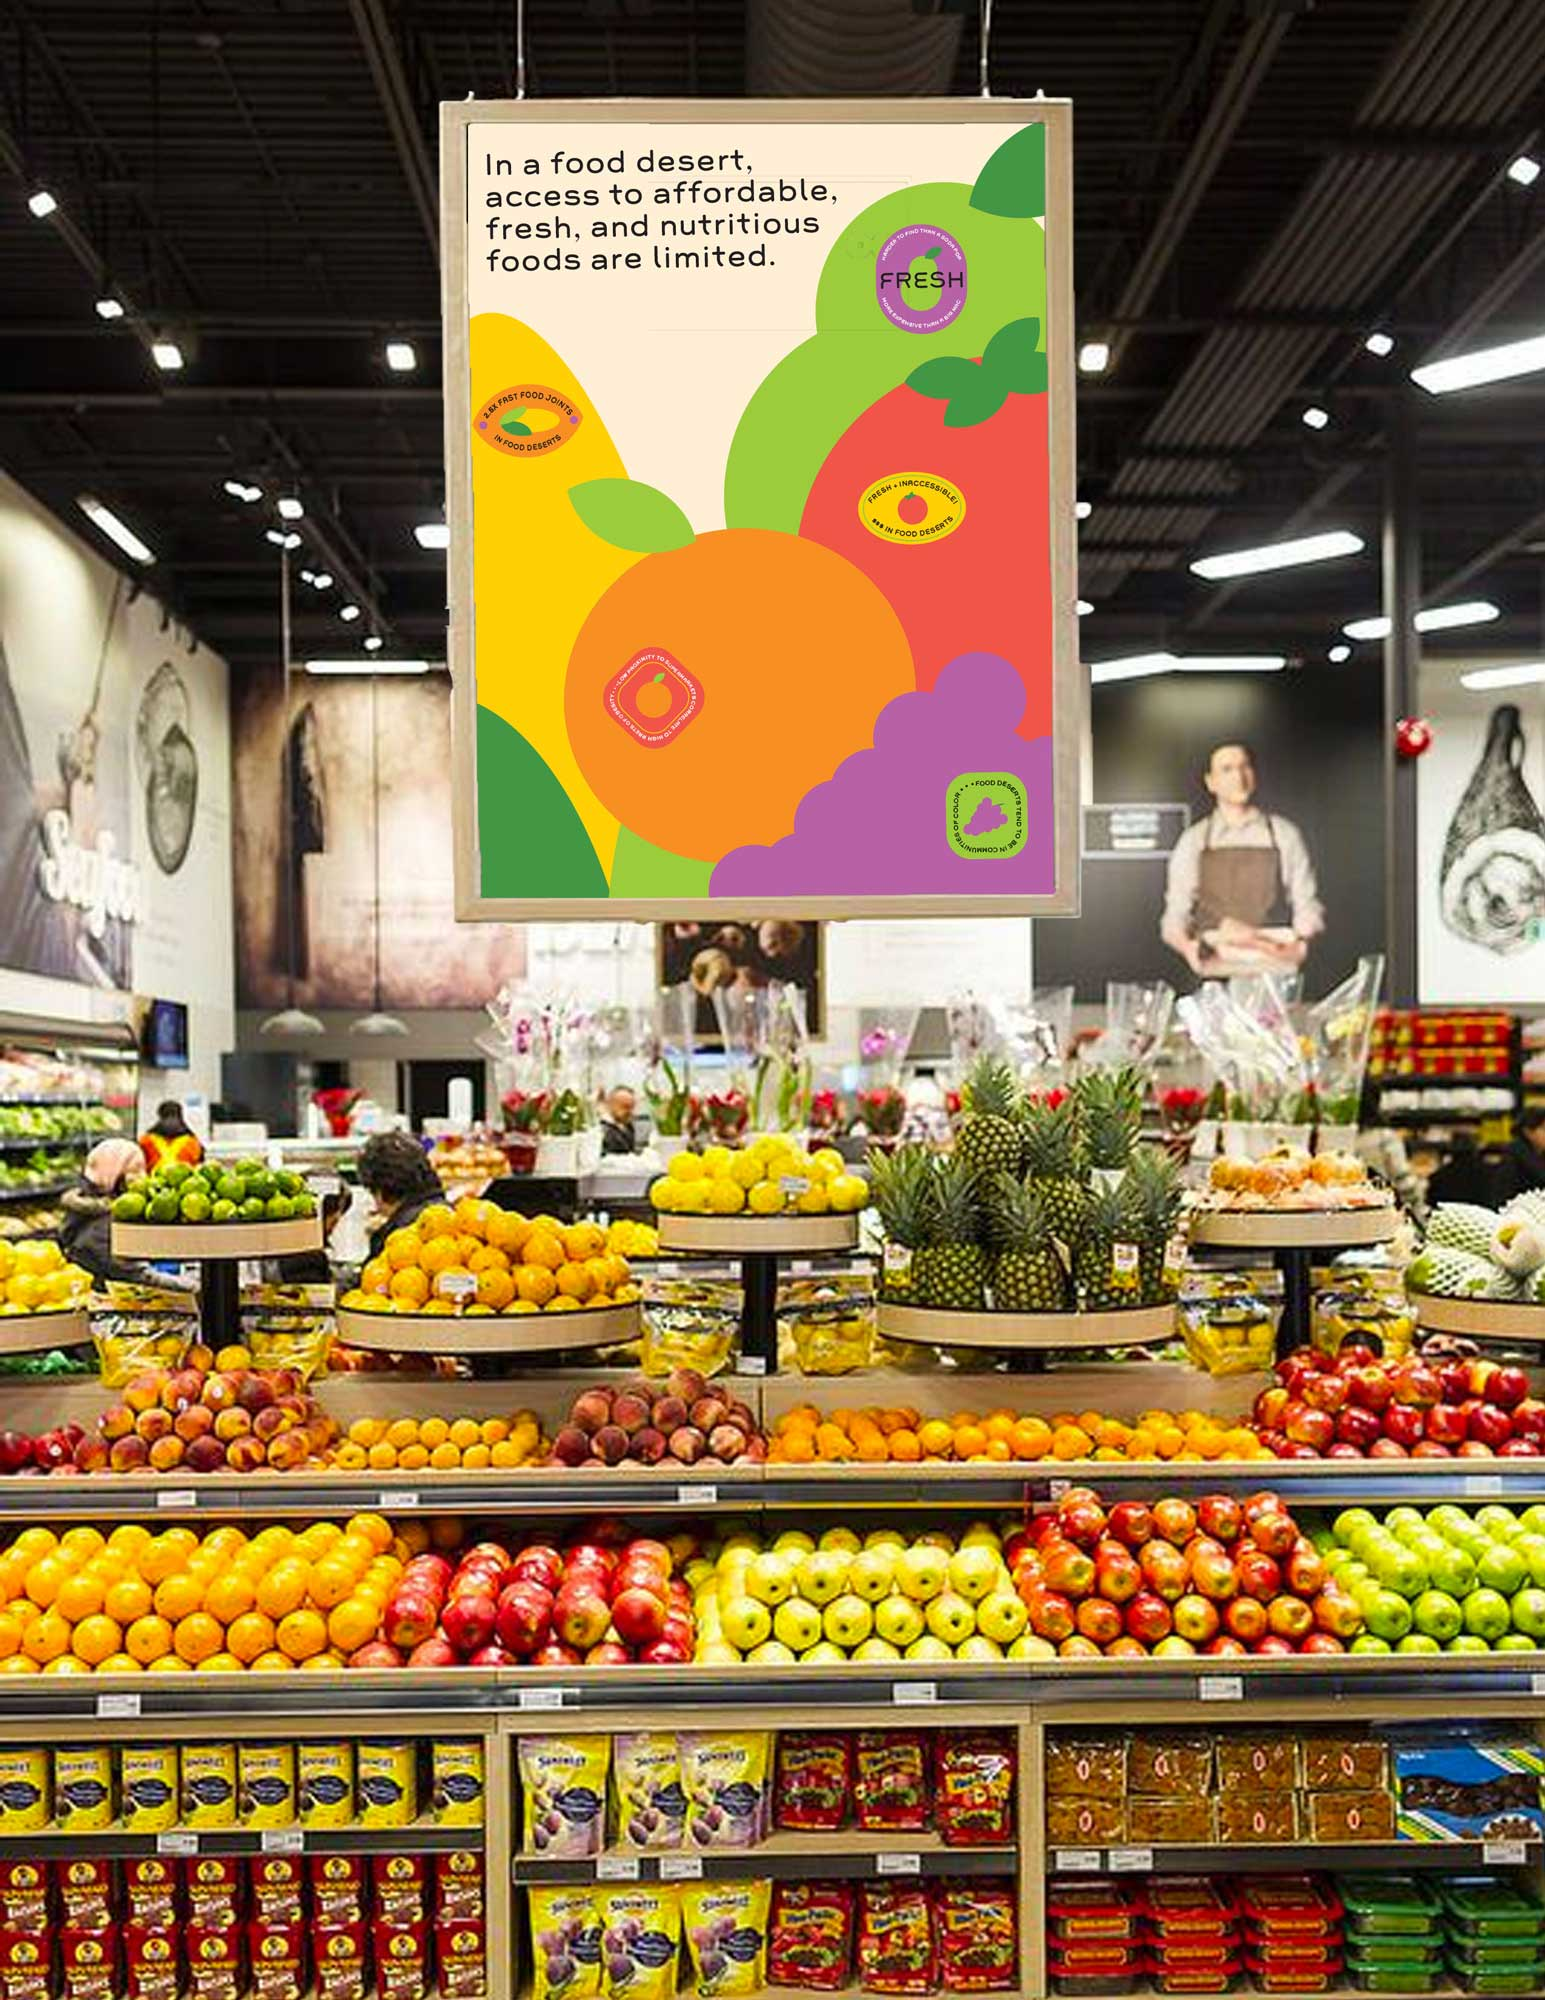 Food Desert Produce Stickers